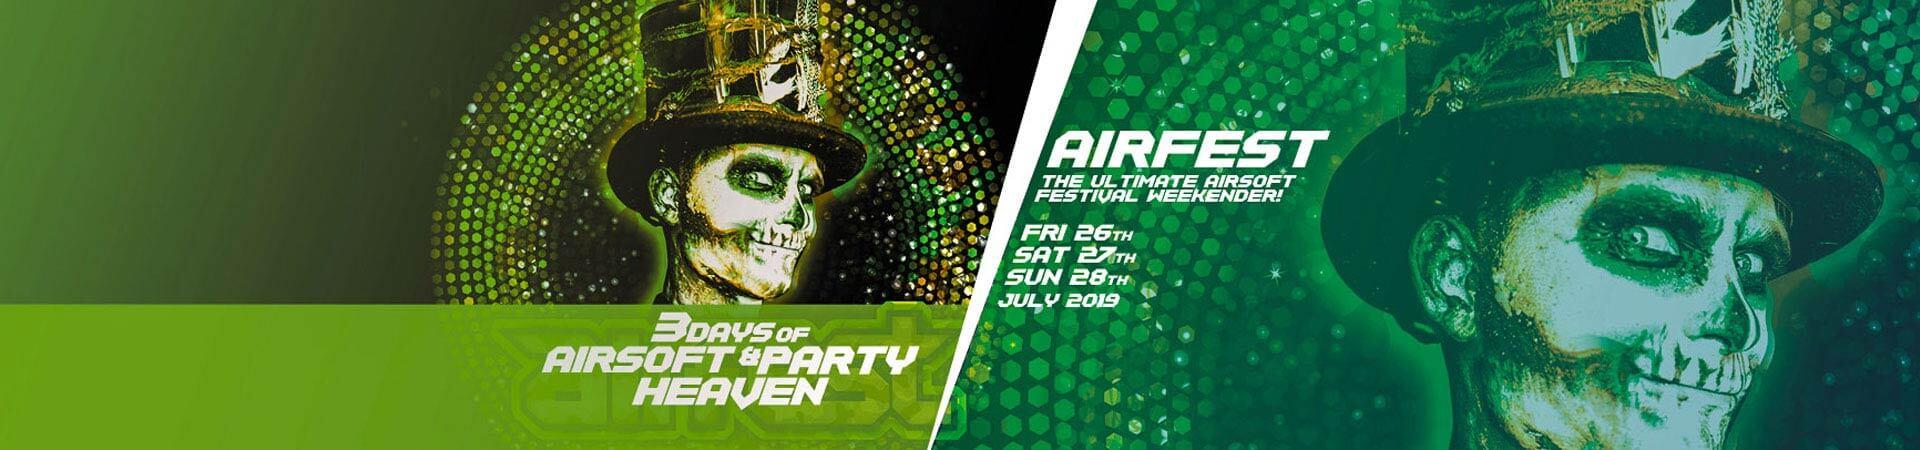 airfest airsoft festival